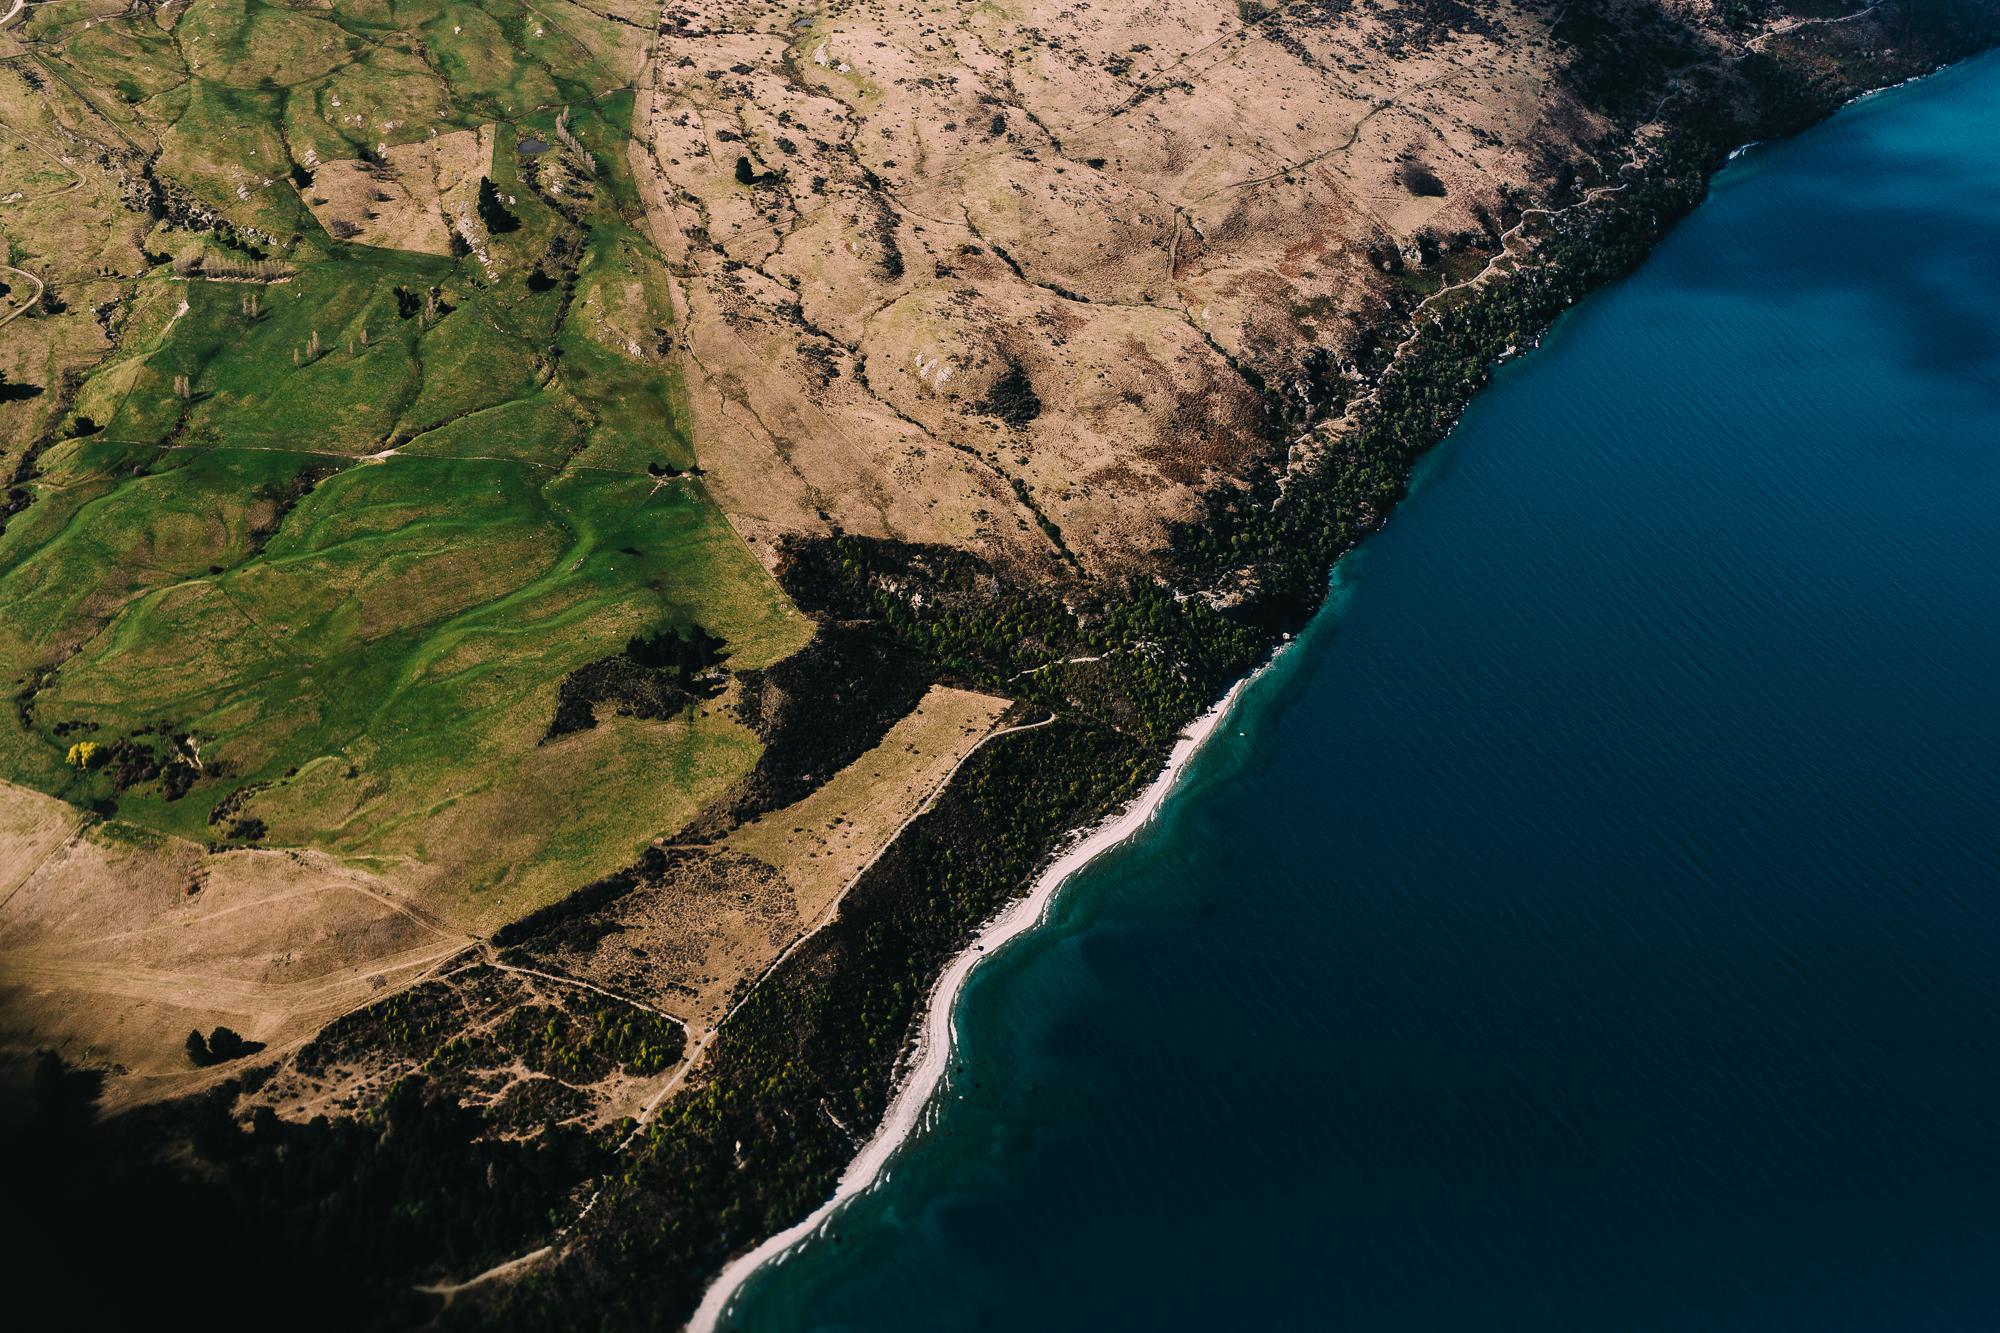 COAST OF THE SOUTH ISLAND